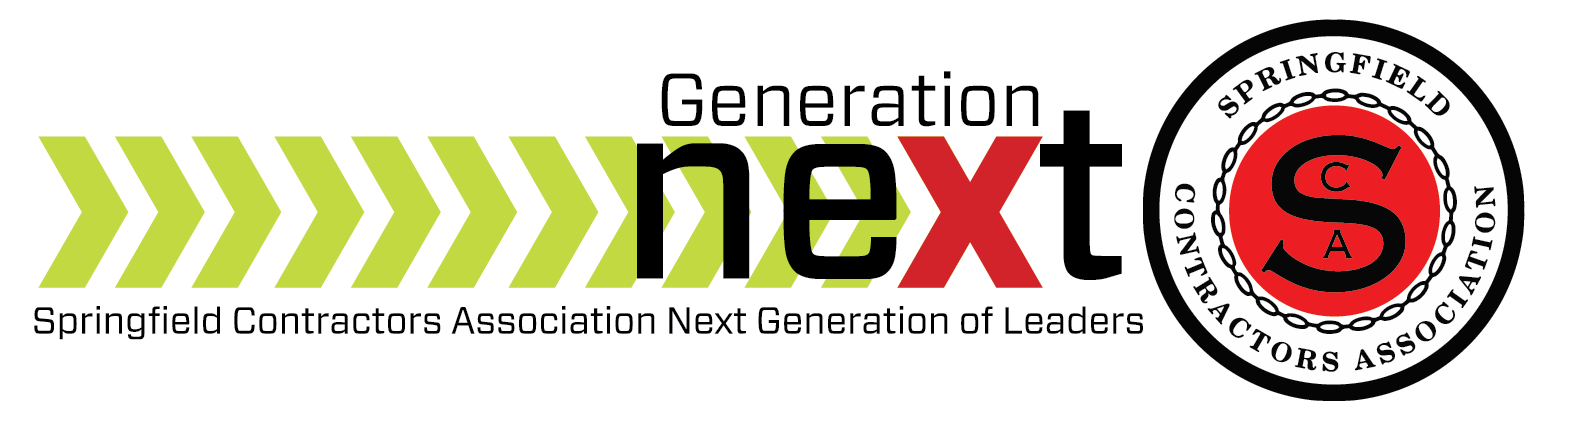 Generation Next Logo